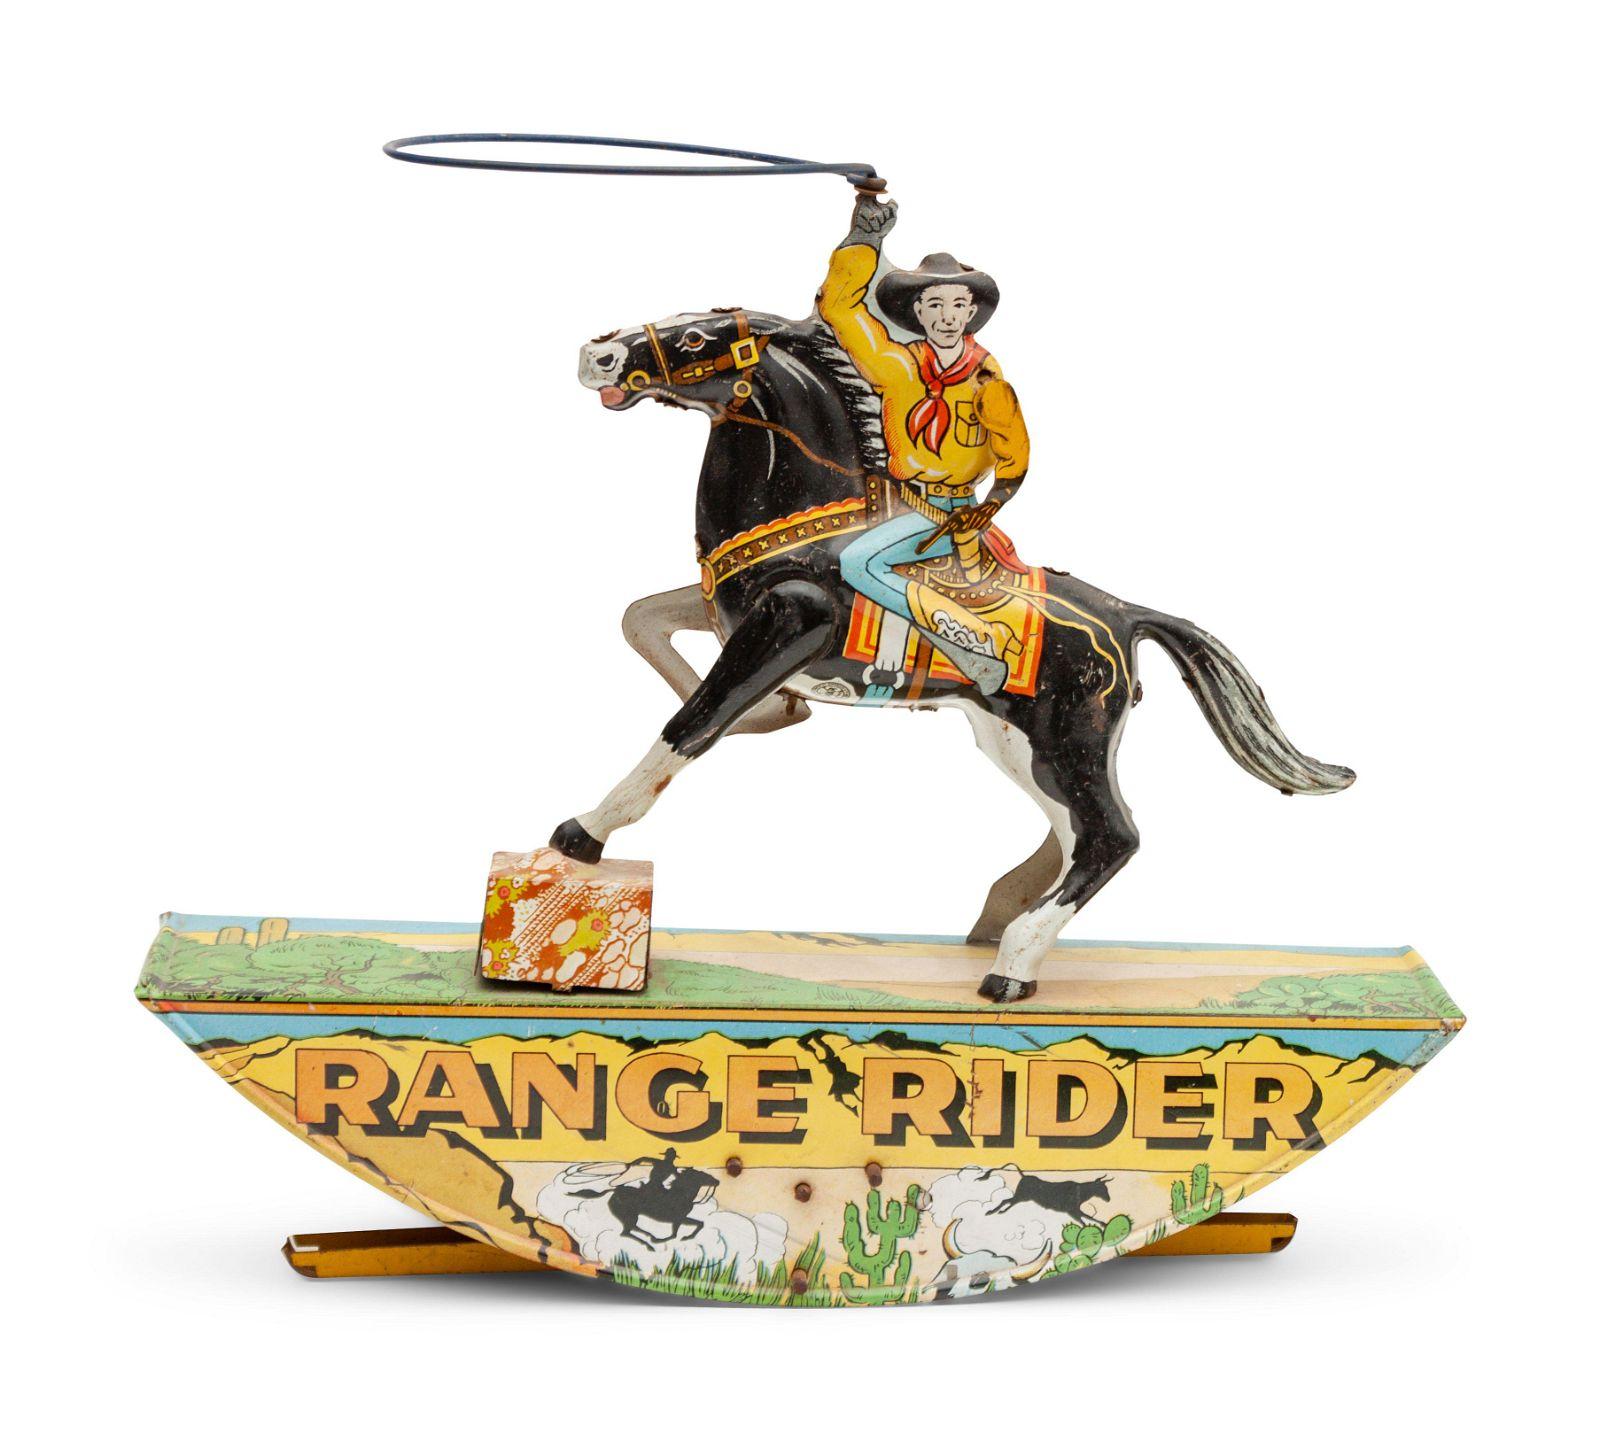 Marx Tin Lithograph Range Rider Toy height 9 1/2 x